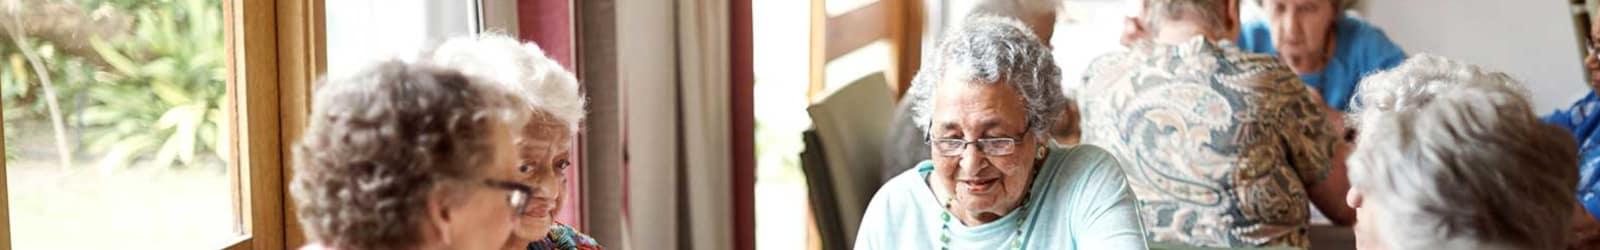 Senior living options at the senior living community in South Carolina